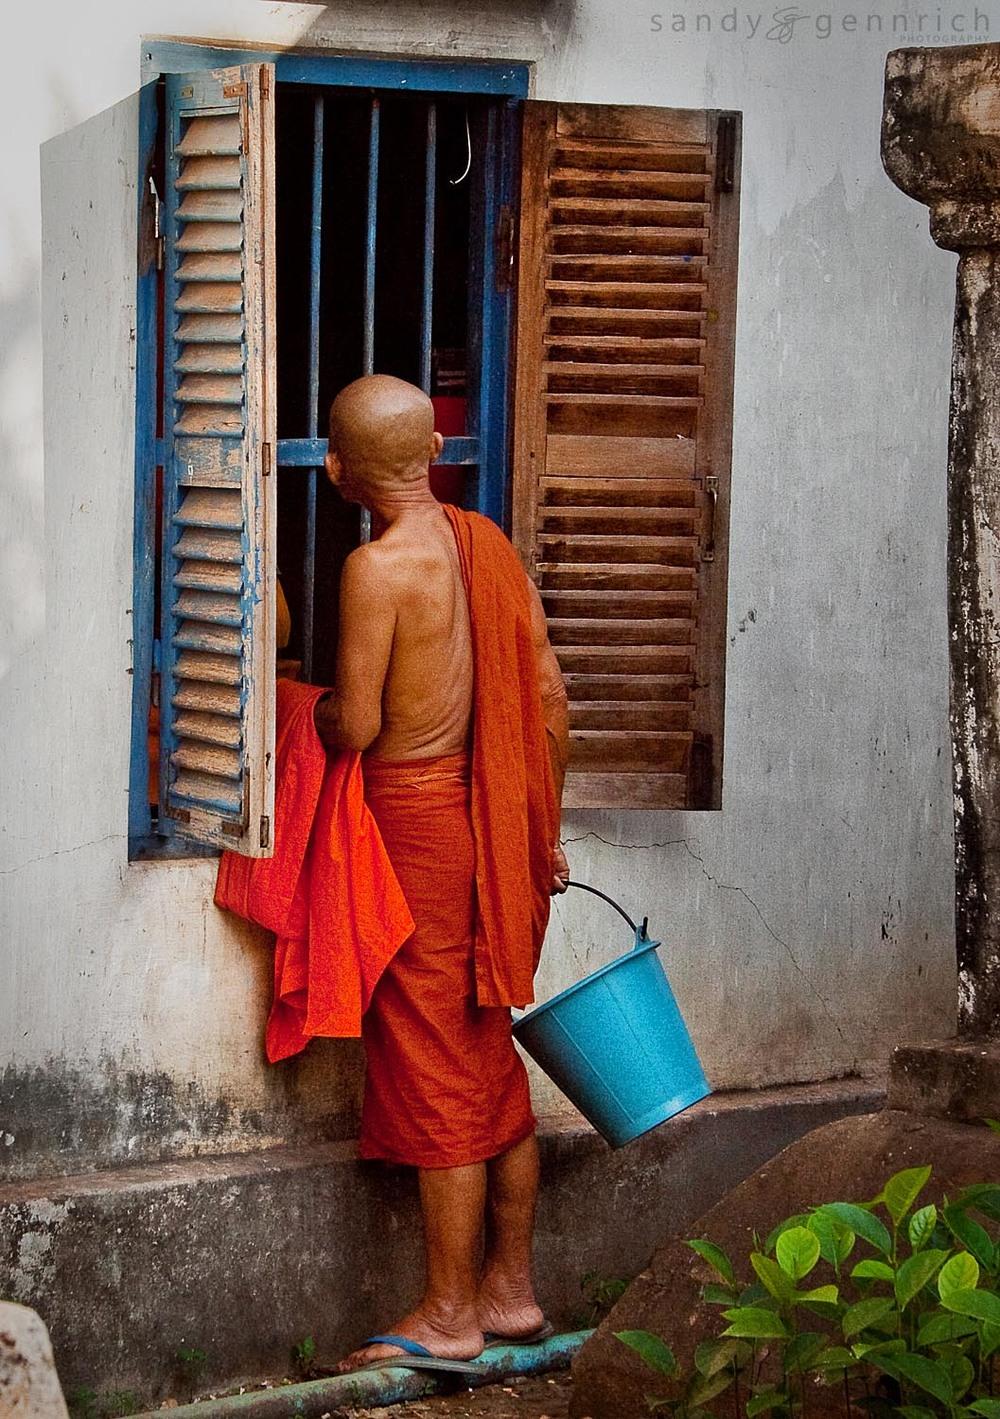 Bathing Monk - Wat Bakong Monastery - Siem Reap - Cambodia